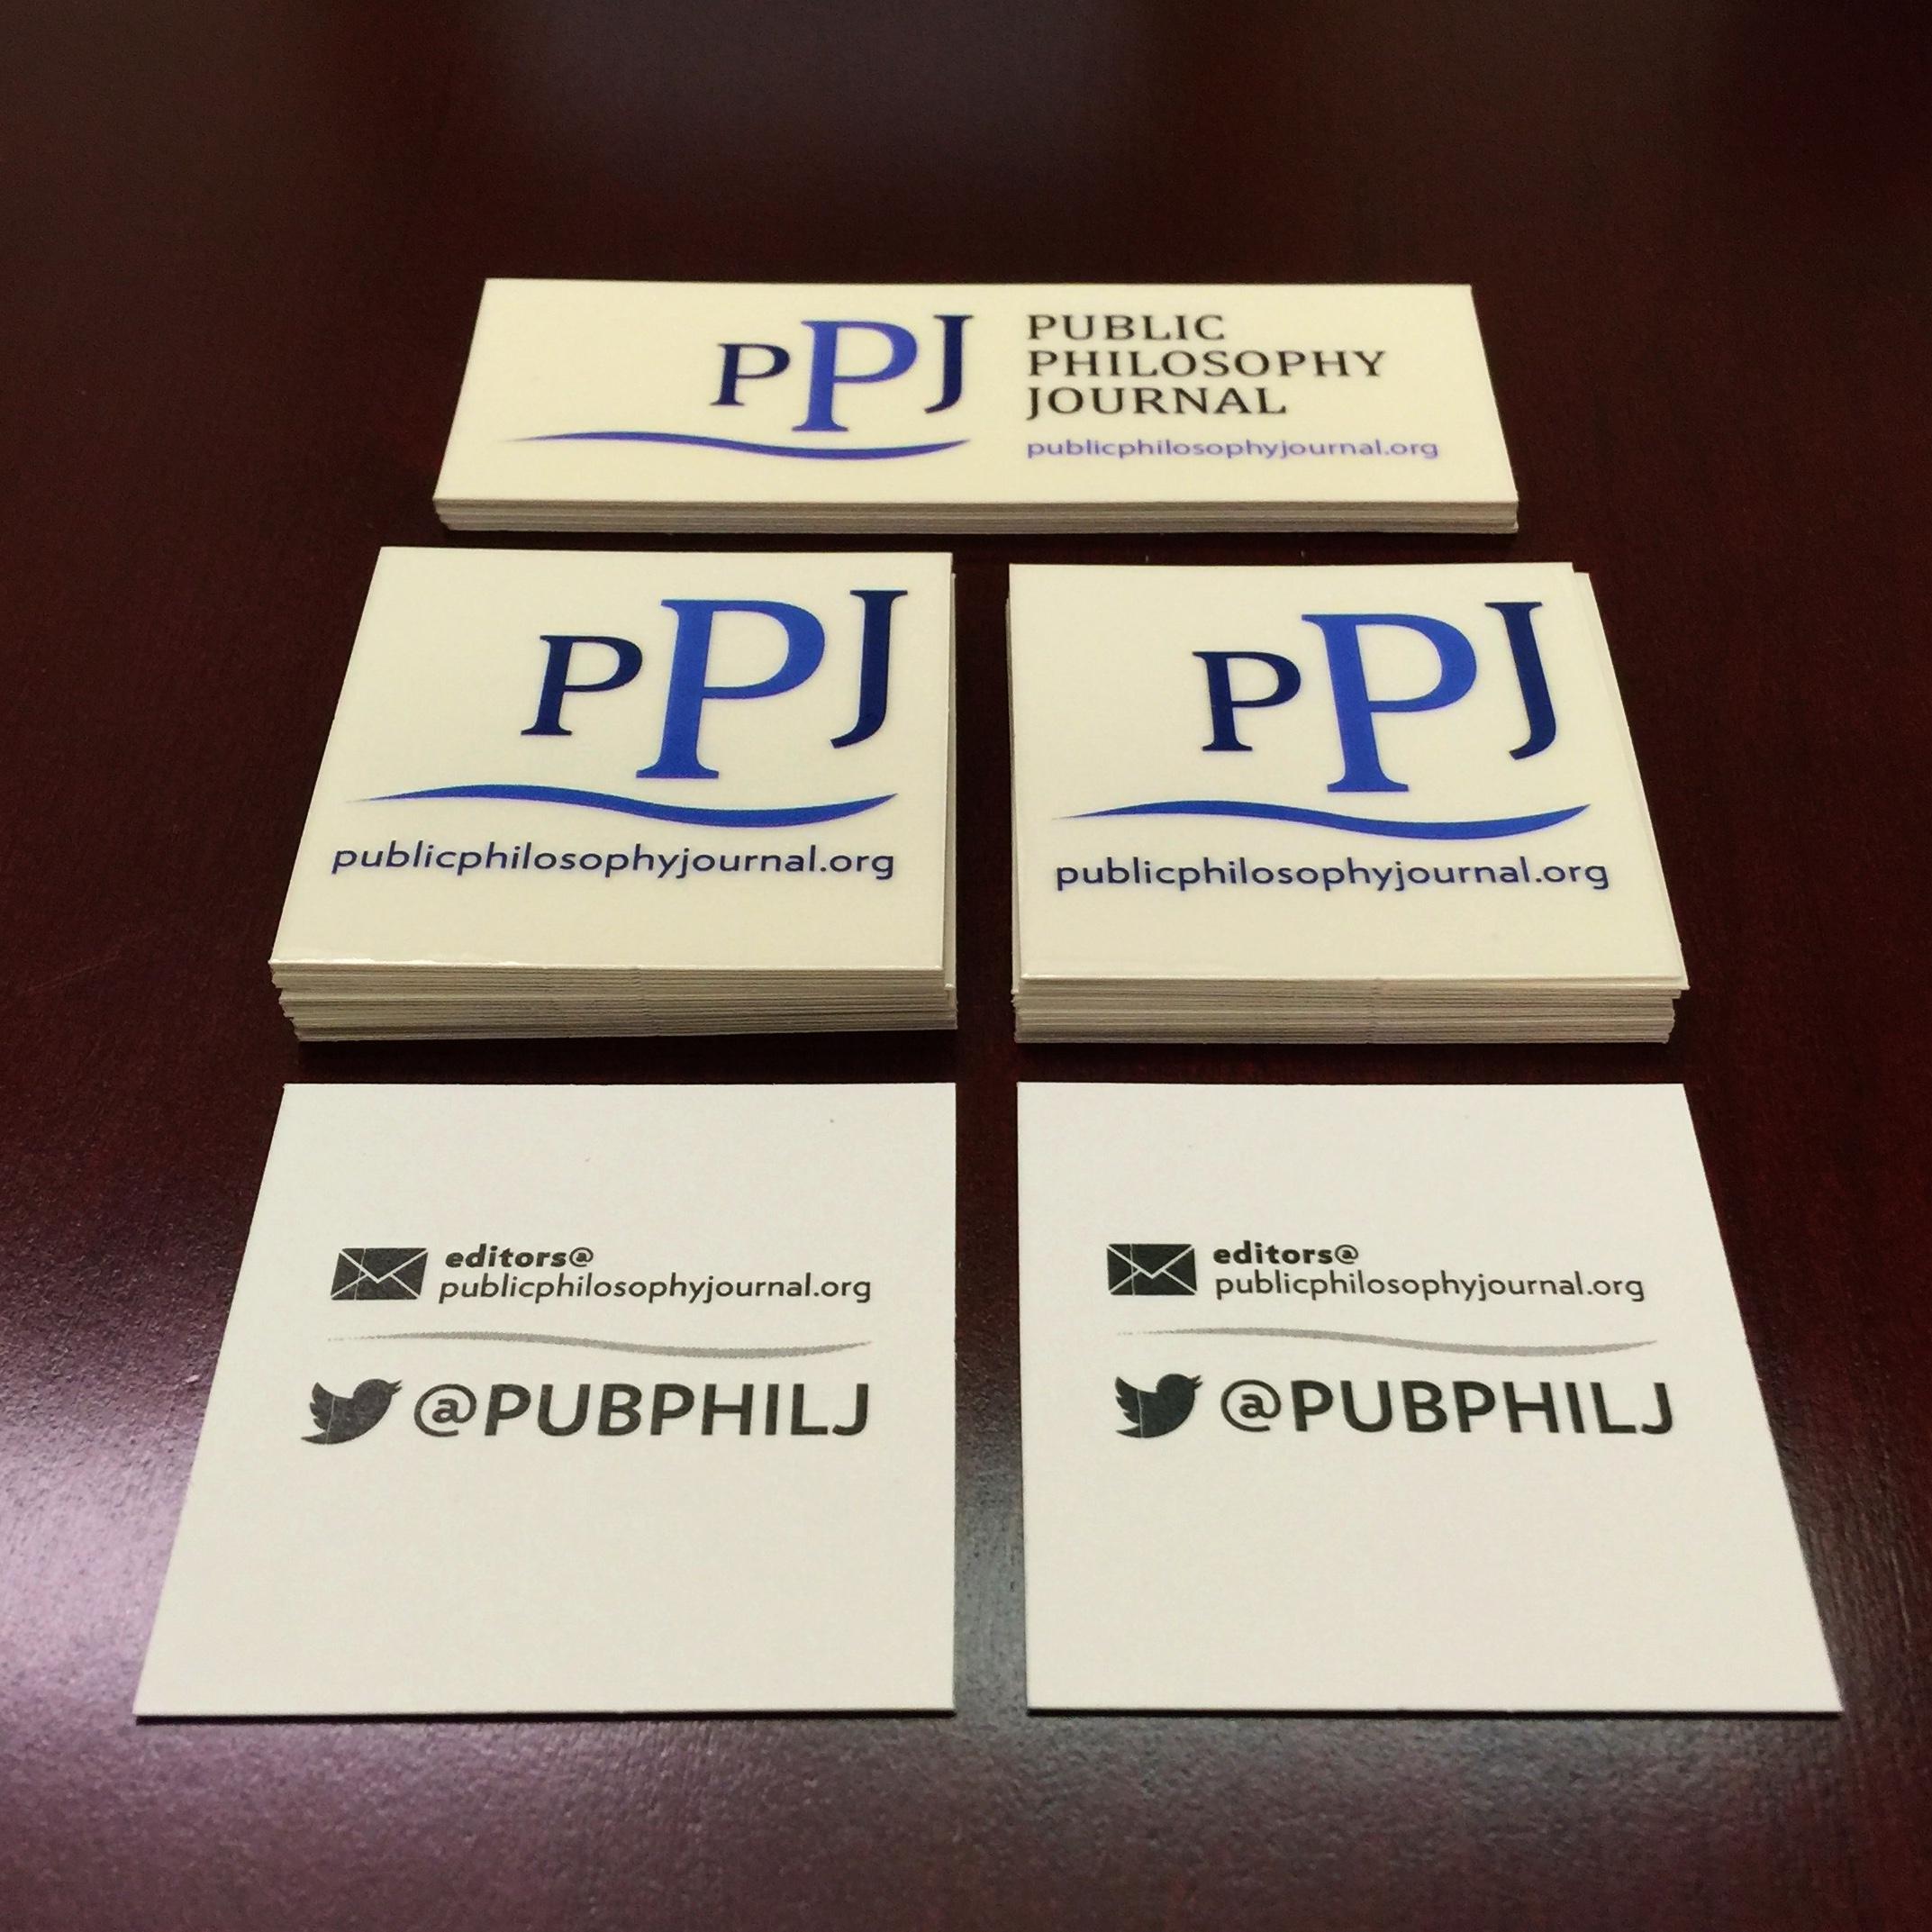 Public Digital Scholarship: The @PubPhilJ at the #APAEastern